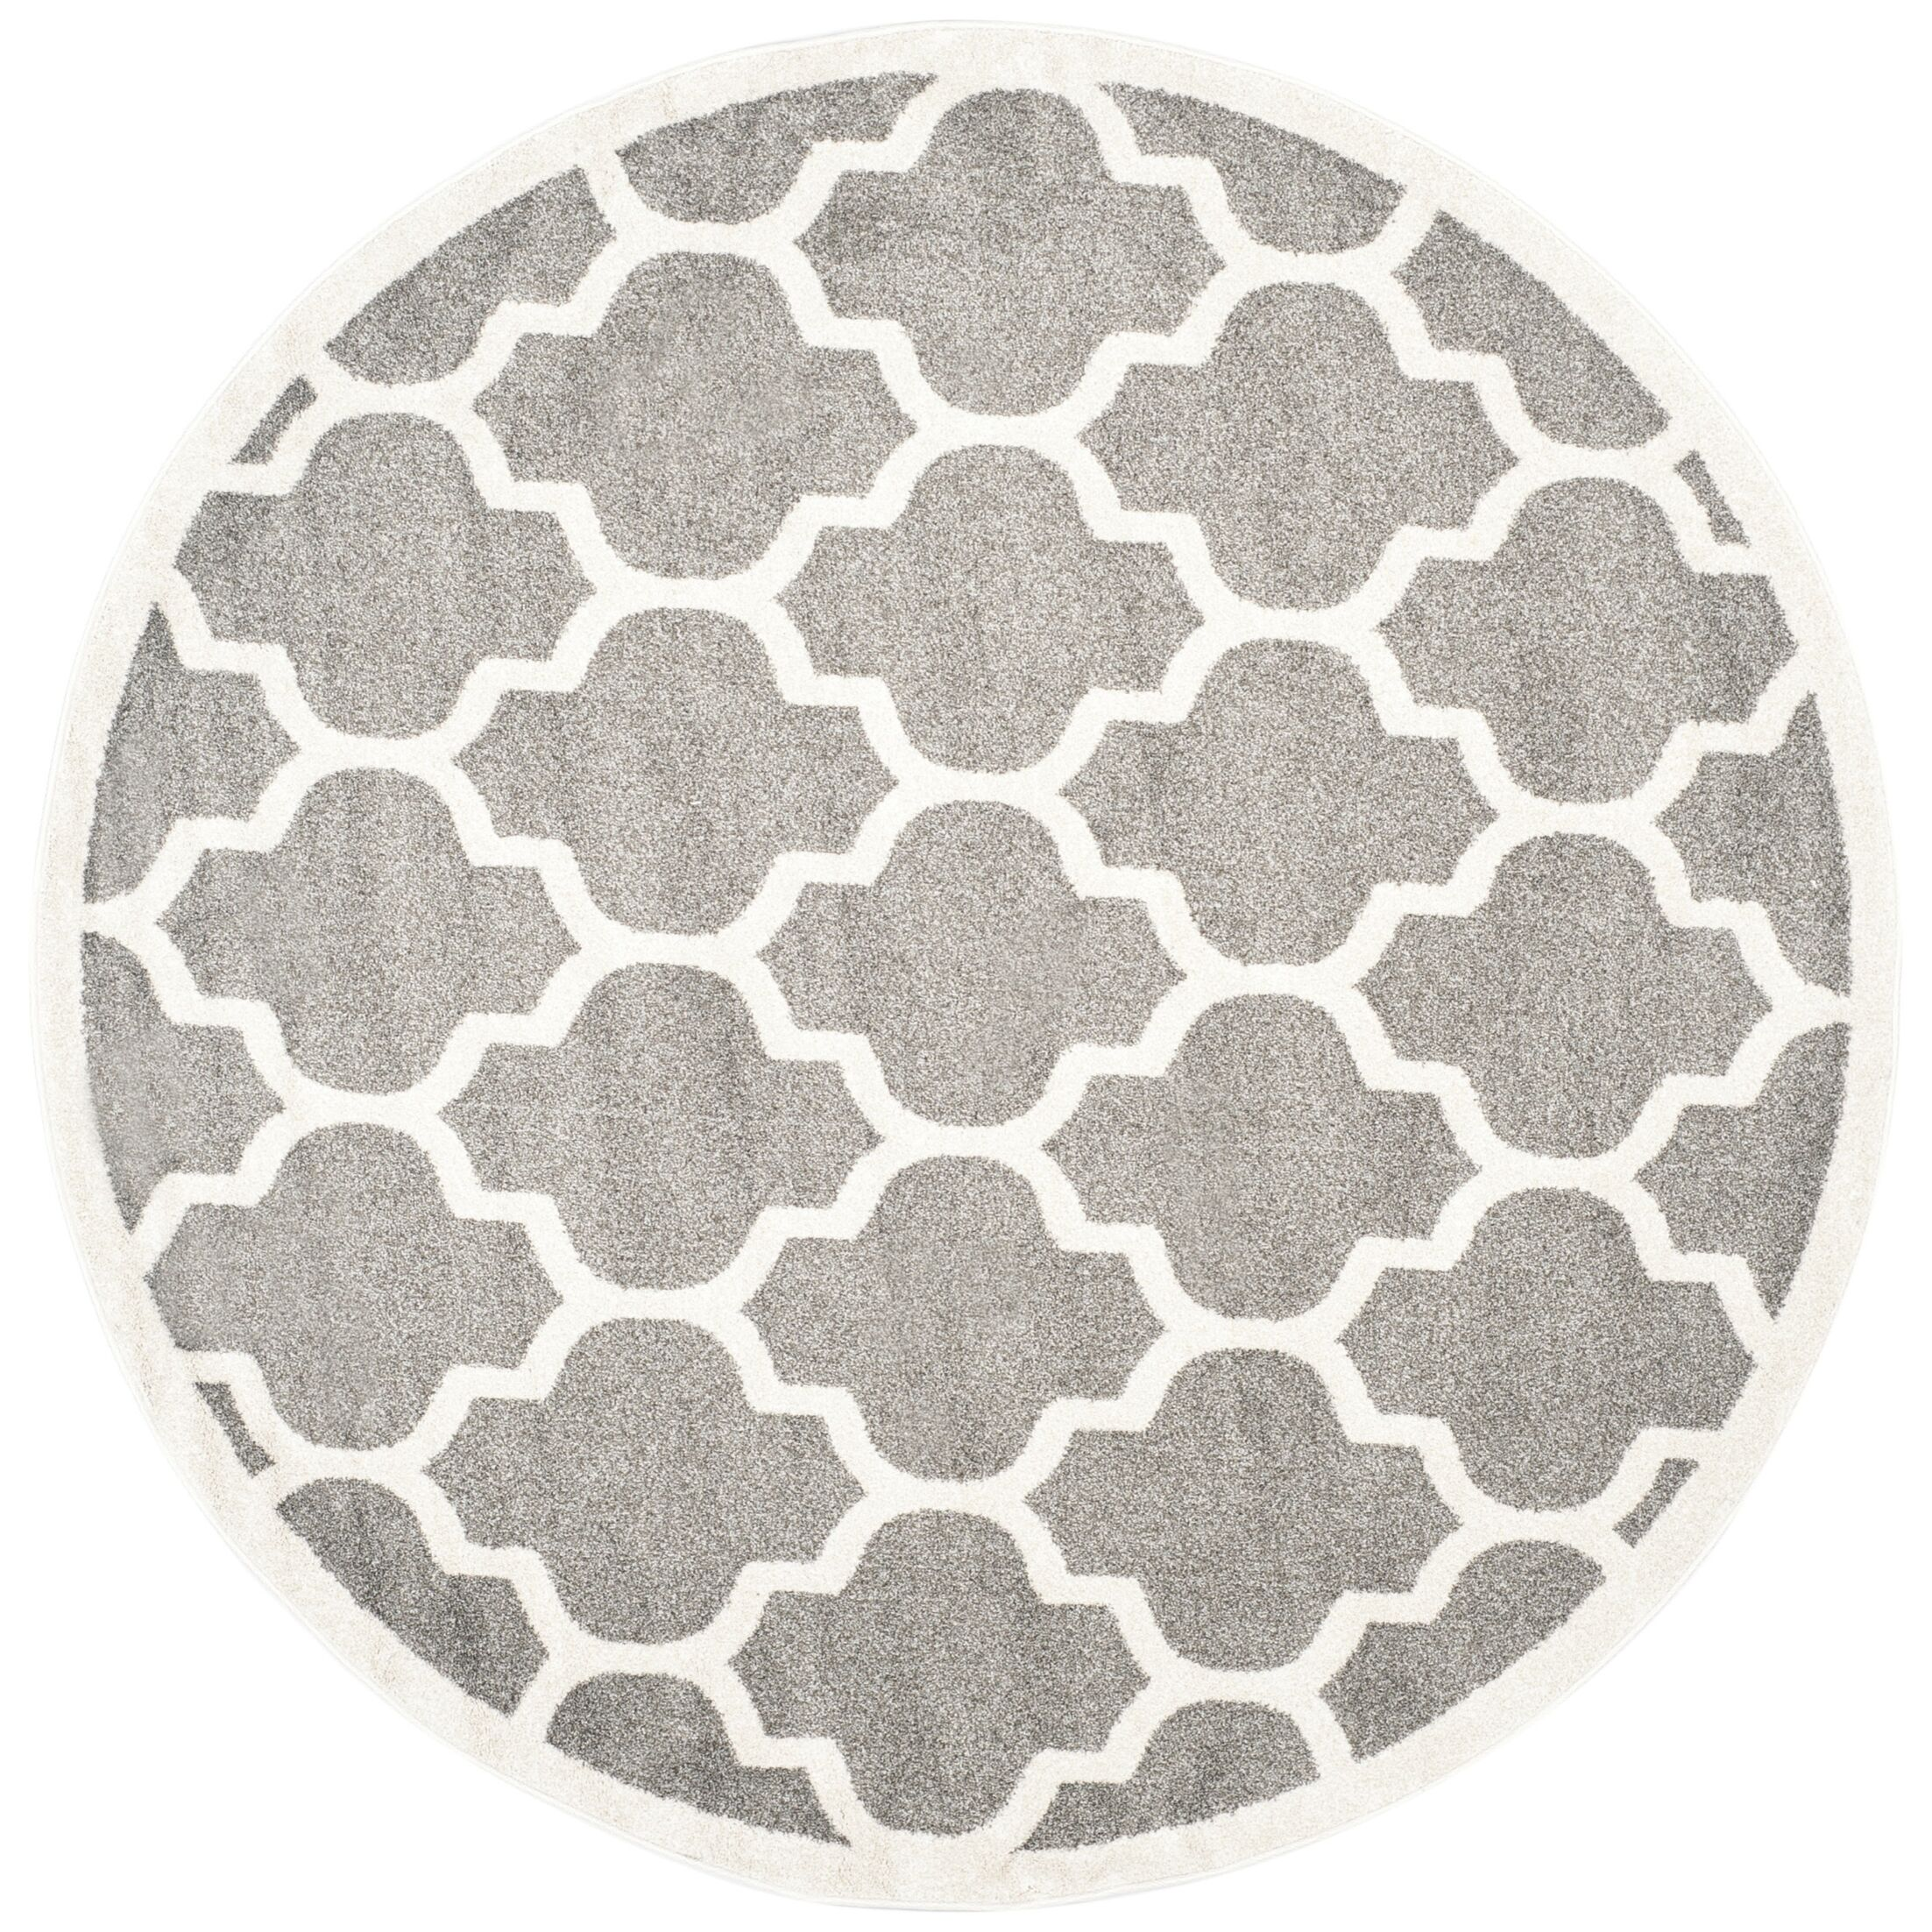 Maritza Trellis Dark Grey/Beige Area Rug Rug Size: Round 5'